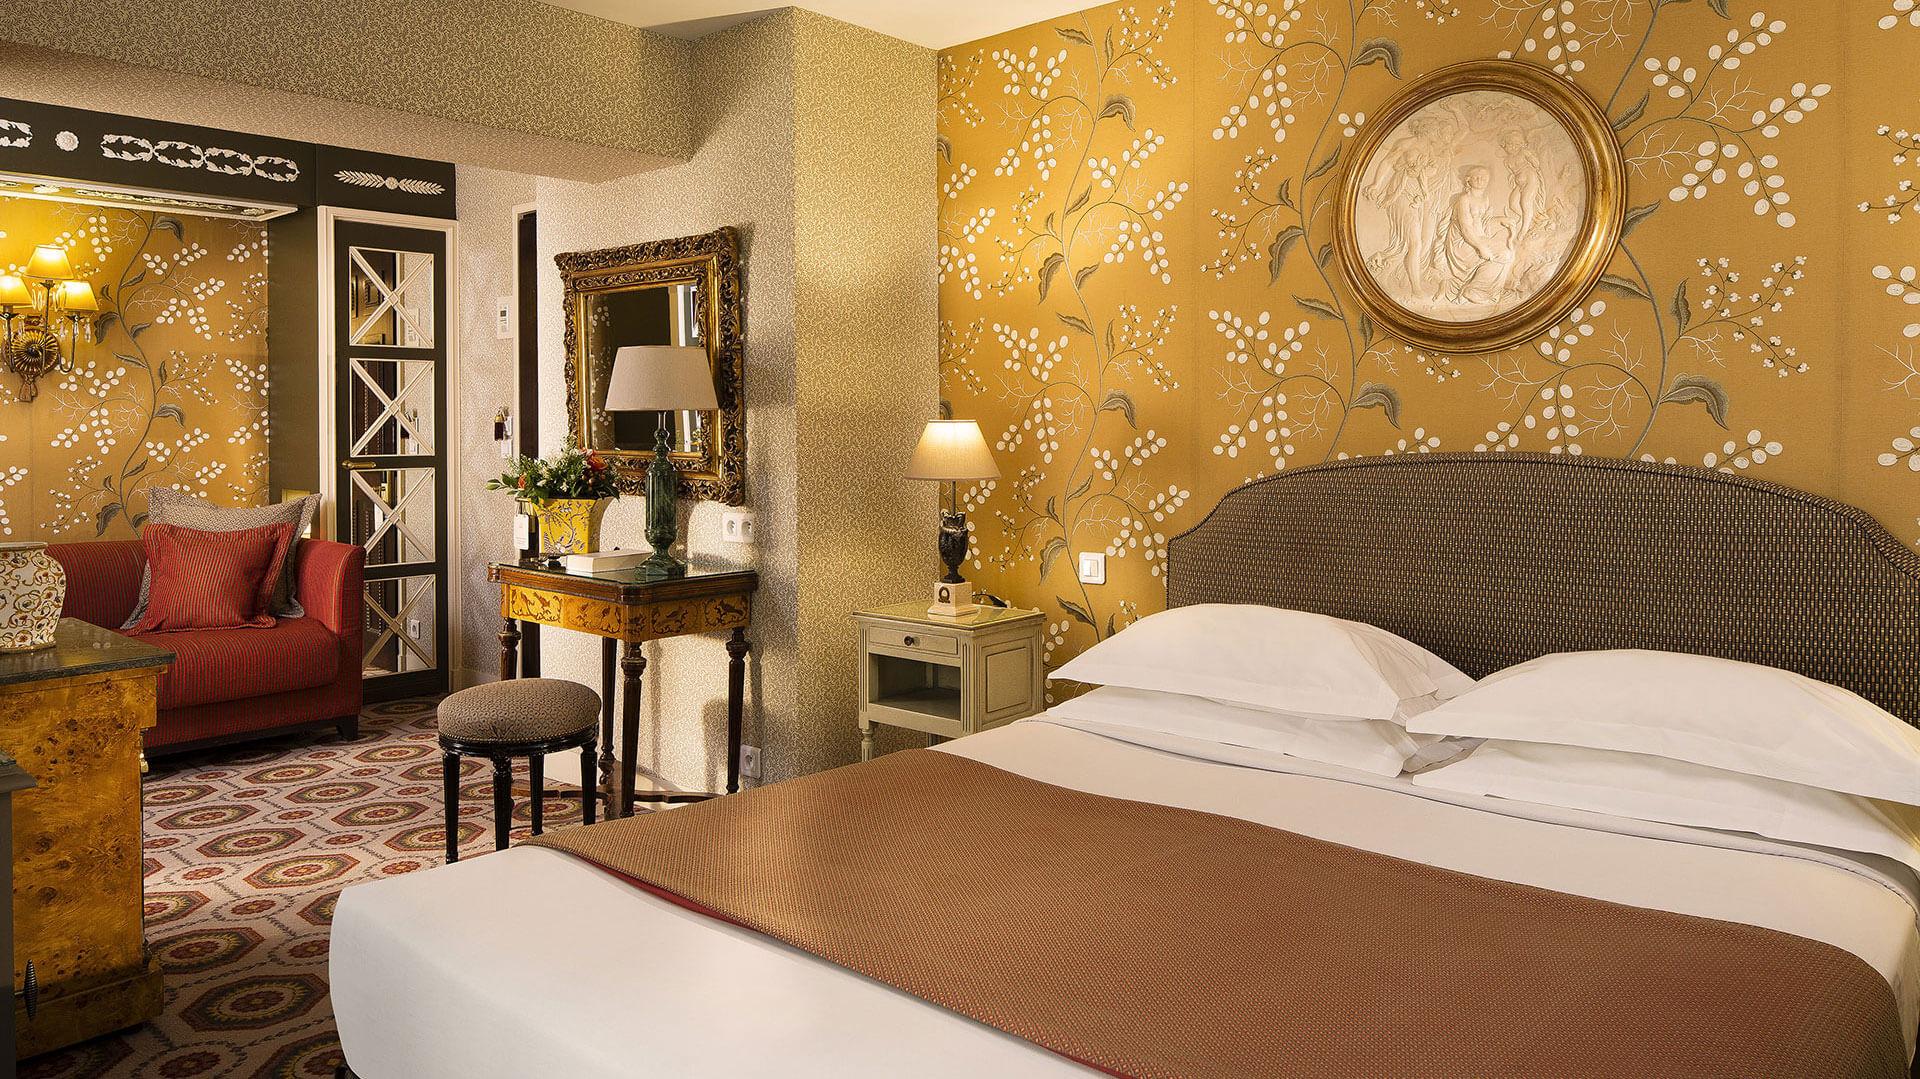 Paris hotel des grands hommes star hotel saint germain